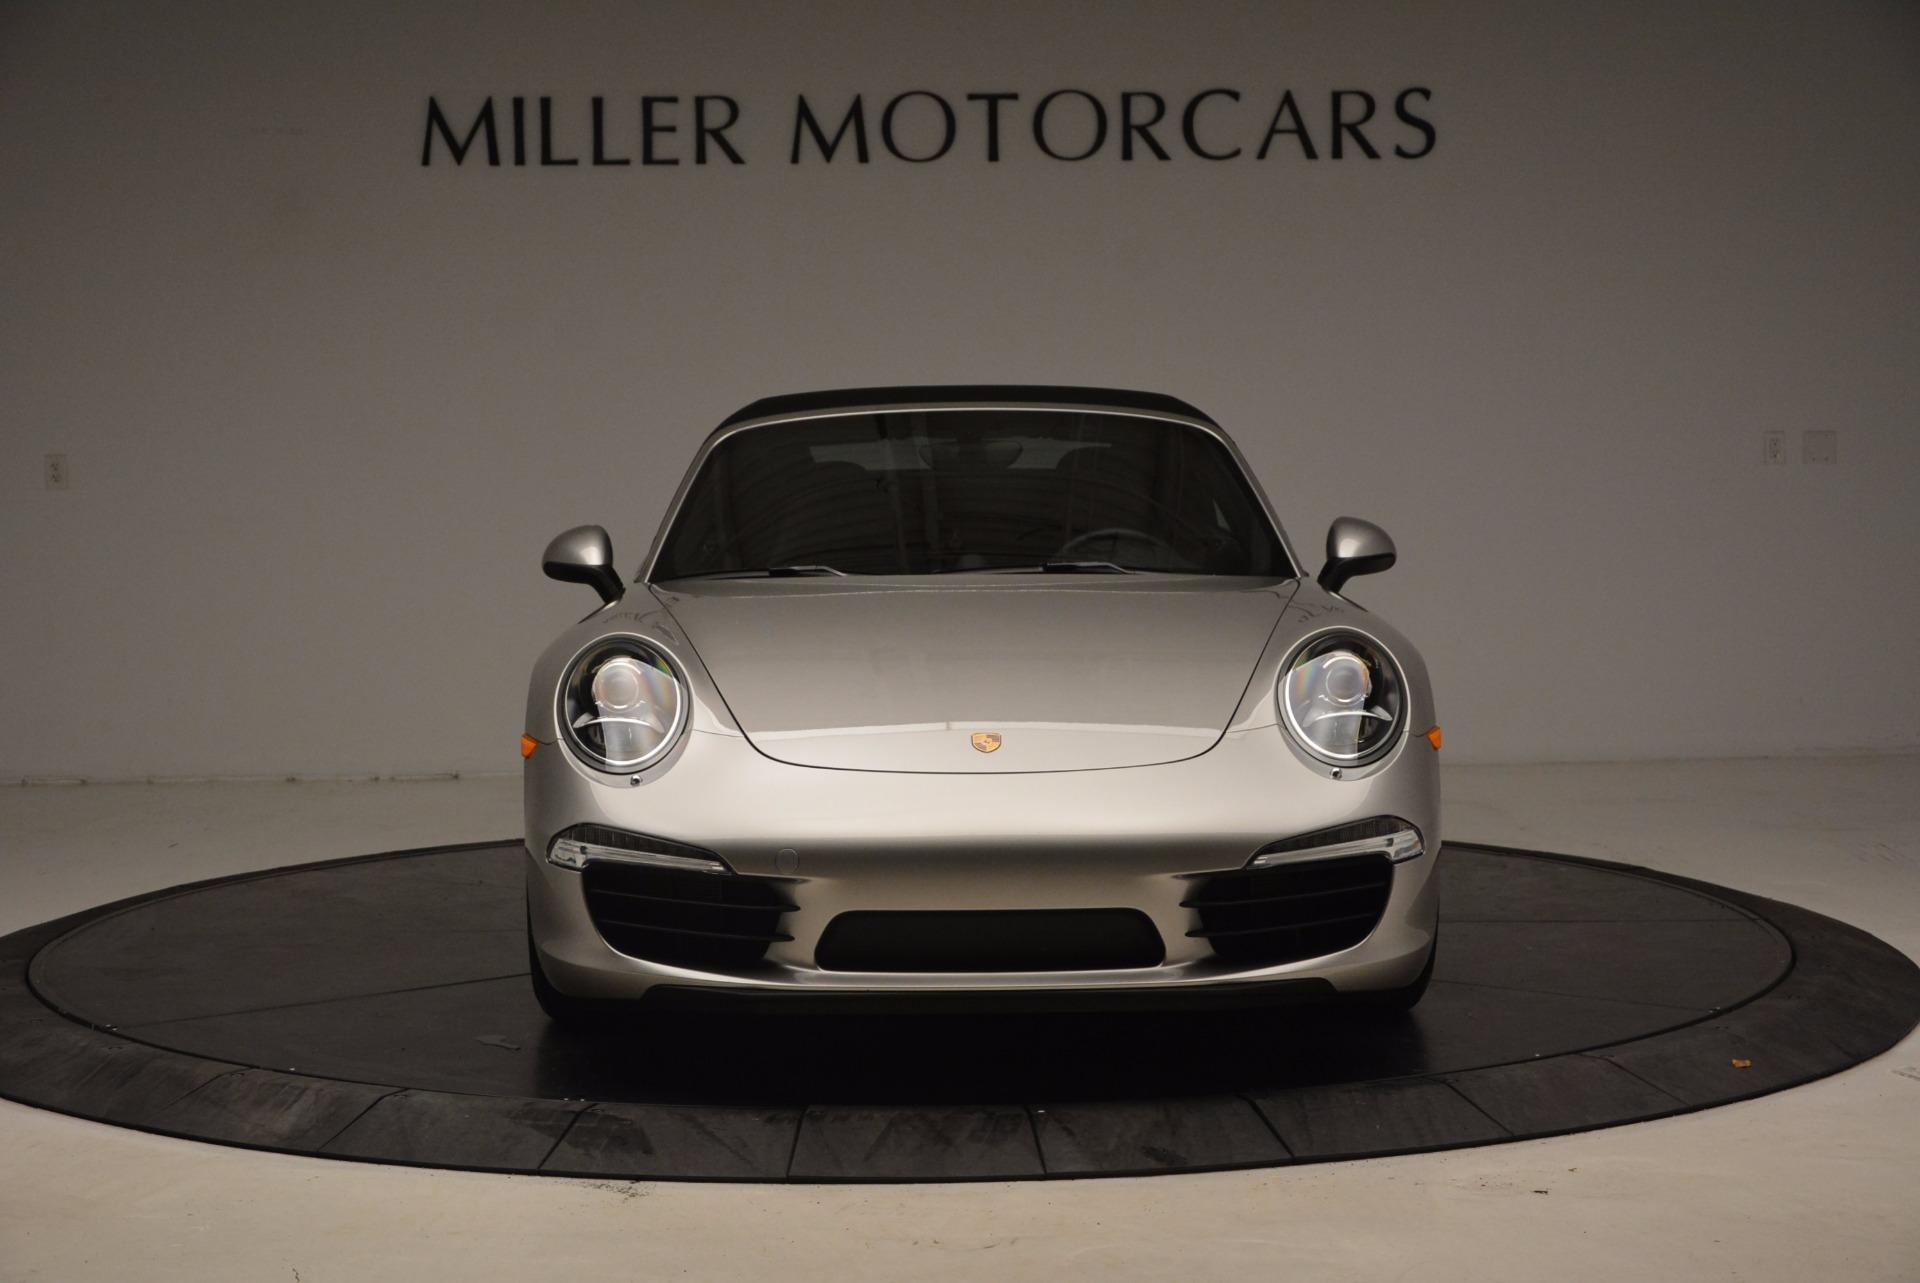 Used 2012 Porsche 911 Carrera S For Sale 0 In Greenwich, CT